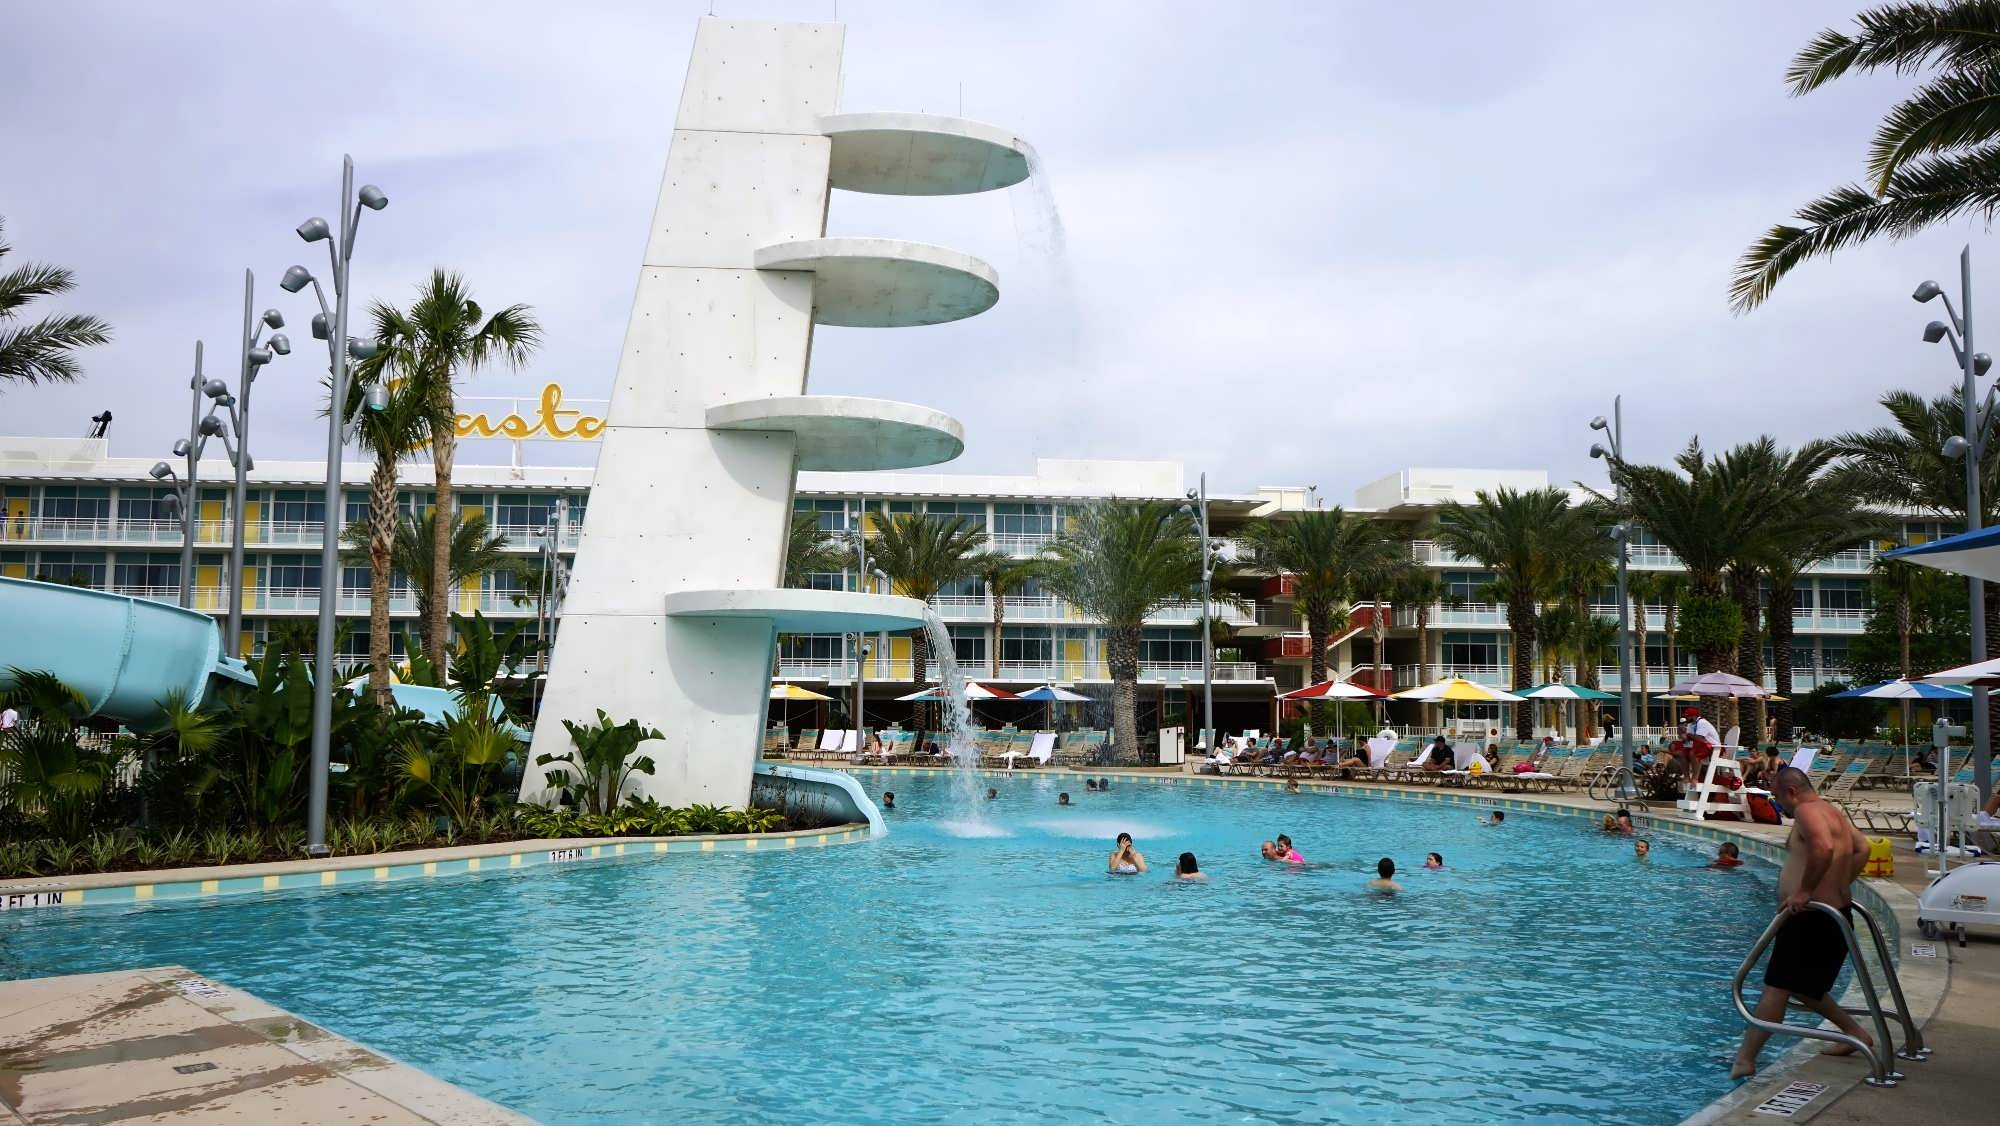 Is The Cabana Bay Beach Resort Pool Heated